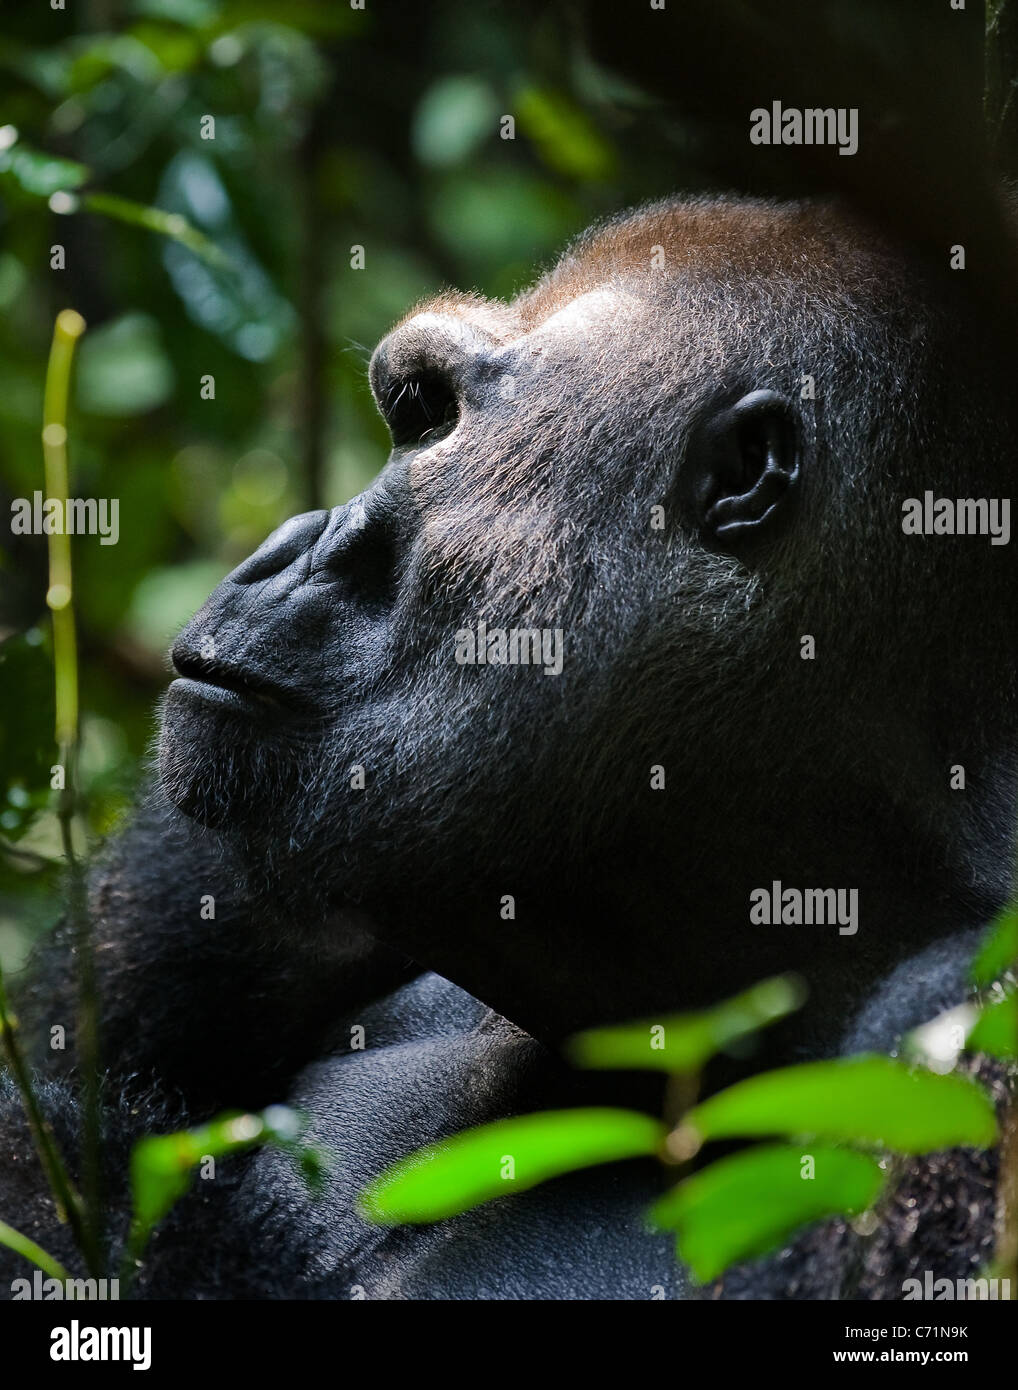 Gorilla leader- Silverback - adult male of a gorilla.Western Lowland Gorilla. - Stock Image